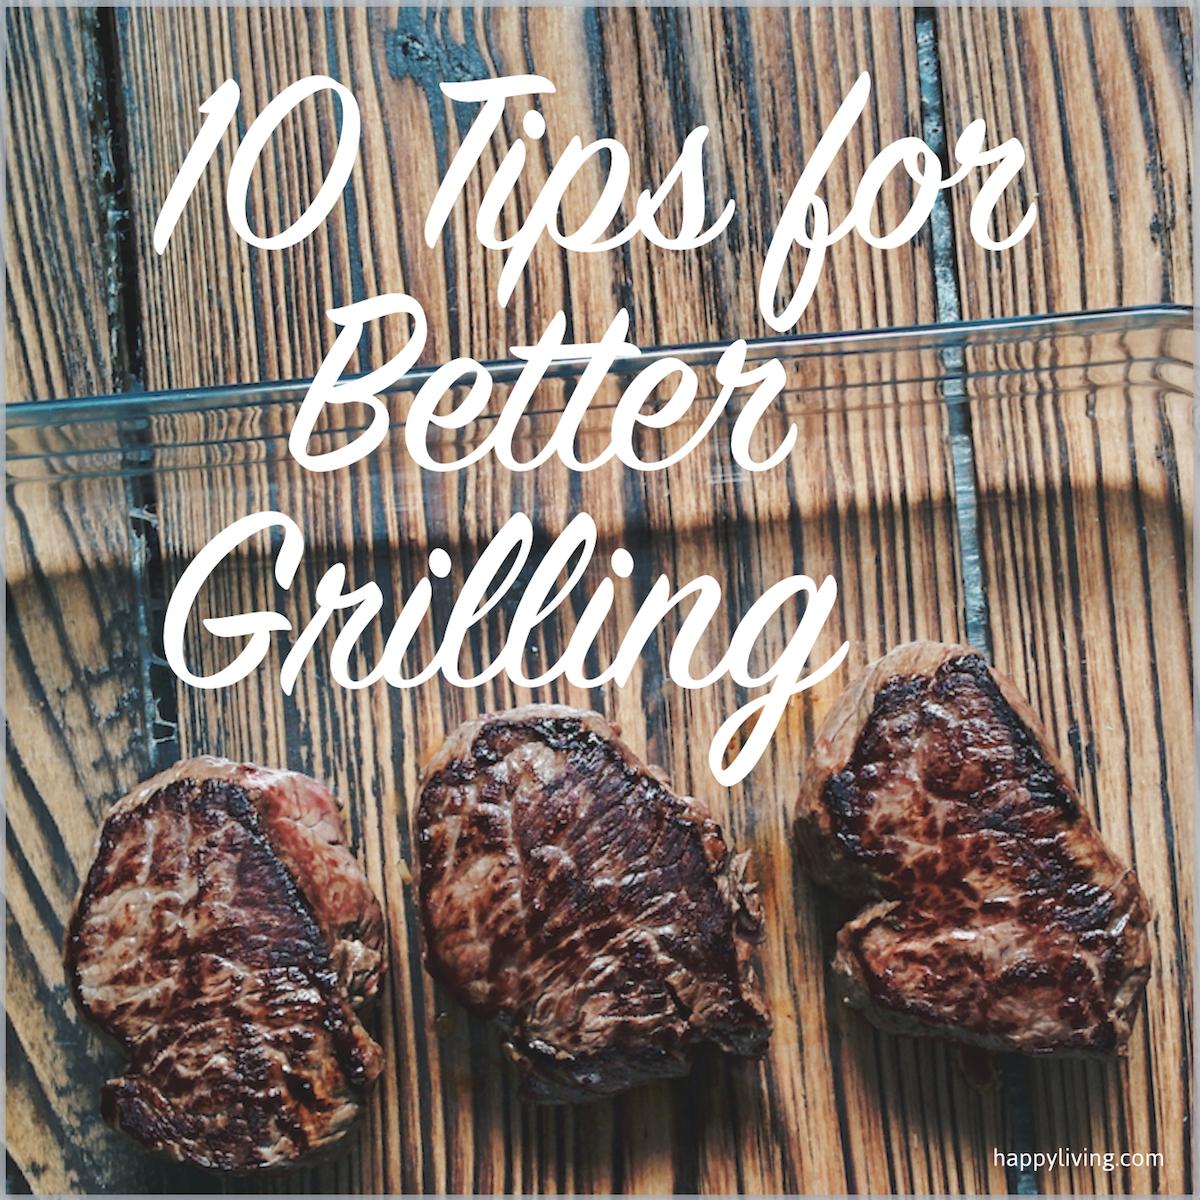 10 Tips for Better Grilling